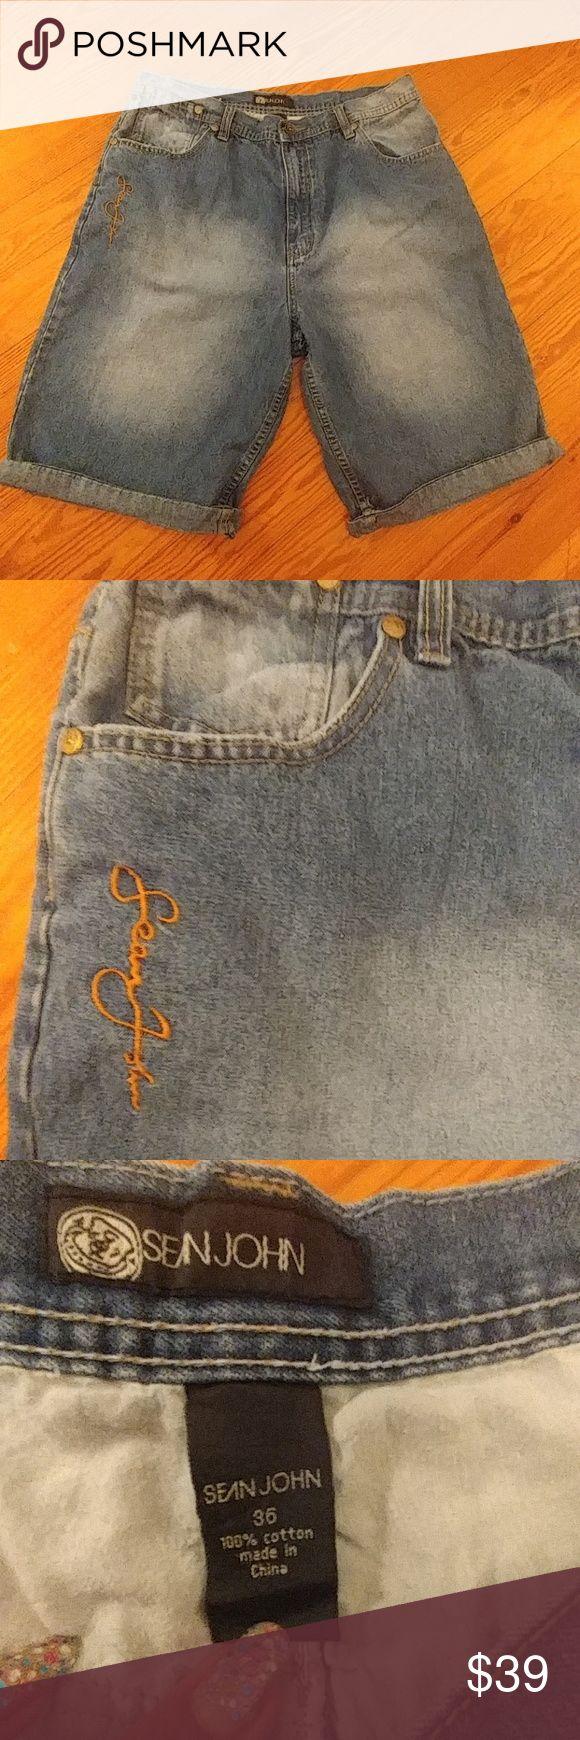 Sean Jean Denim Shorts Stonewashed. 100% cotton. Approx 17in waist flat. Approx 12 in inseam. Good condition! Sean John Shorts